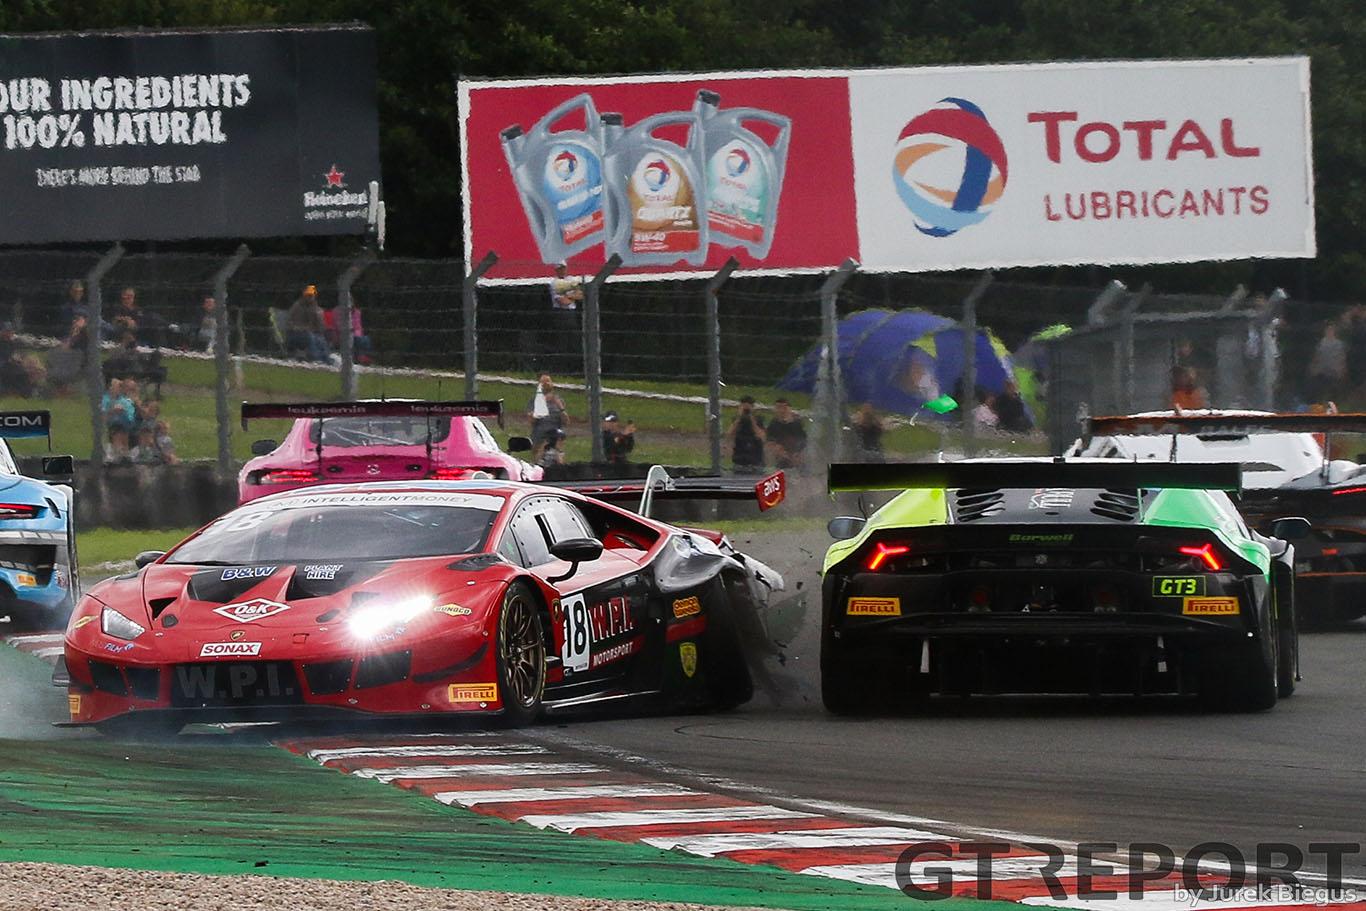 British GT Donington Park: Nearys take well-earned win in race of attrition